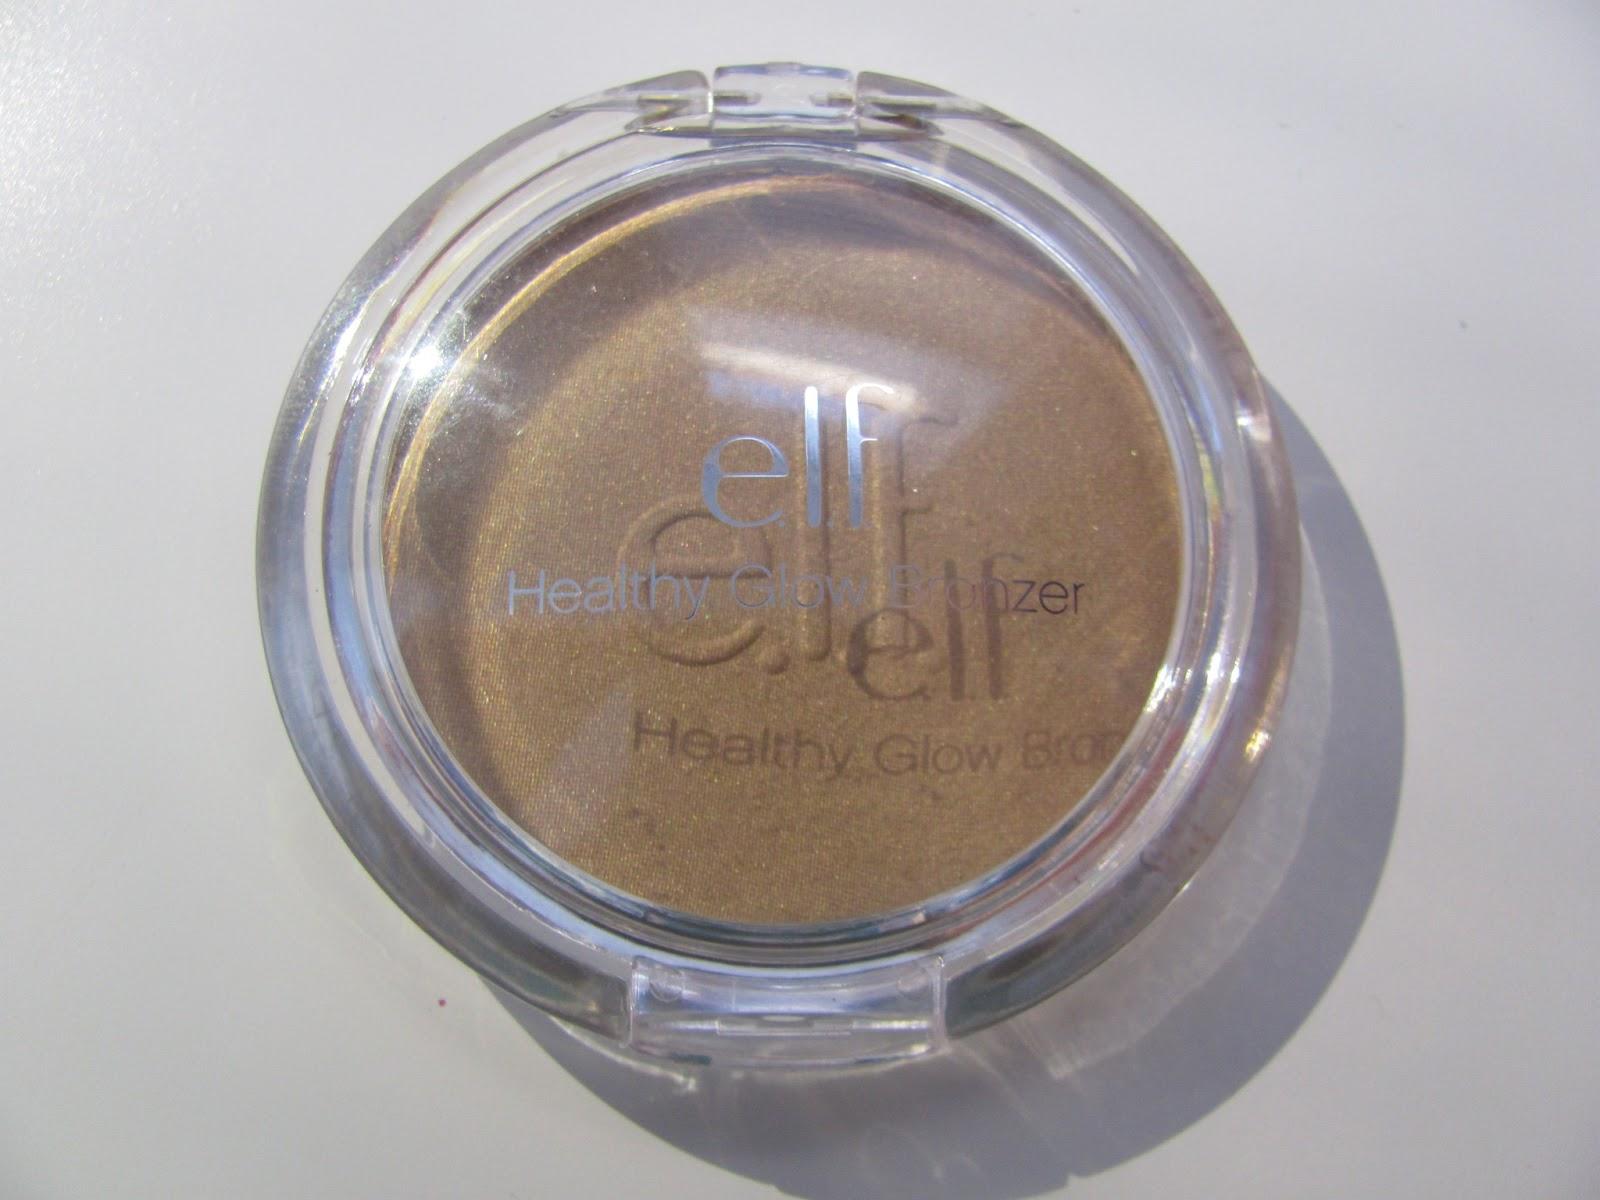 Elf Healthy Glow Bronzing Powder Sunkissed; Review ...